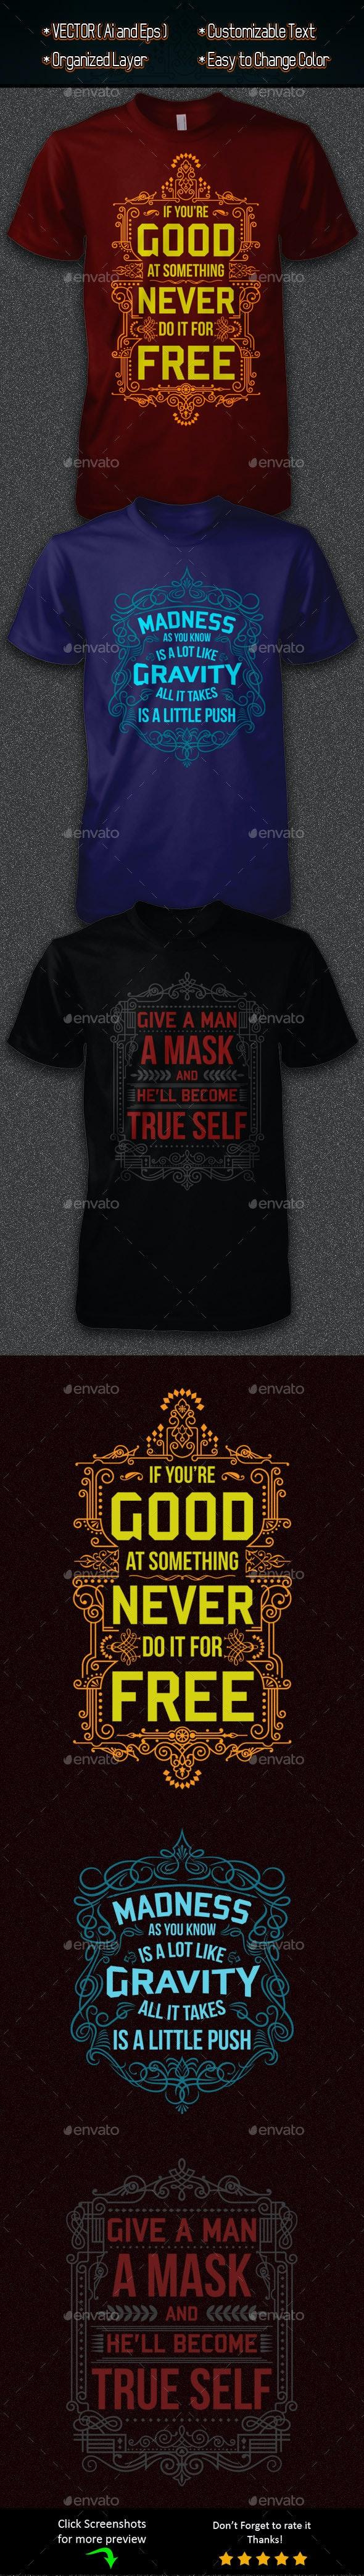 Joker Quotes - Designs T-Shirts